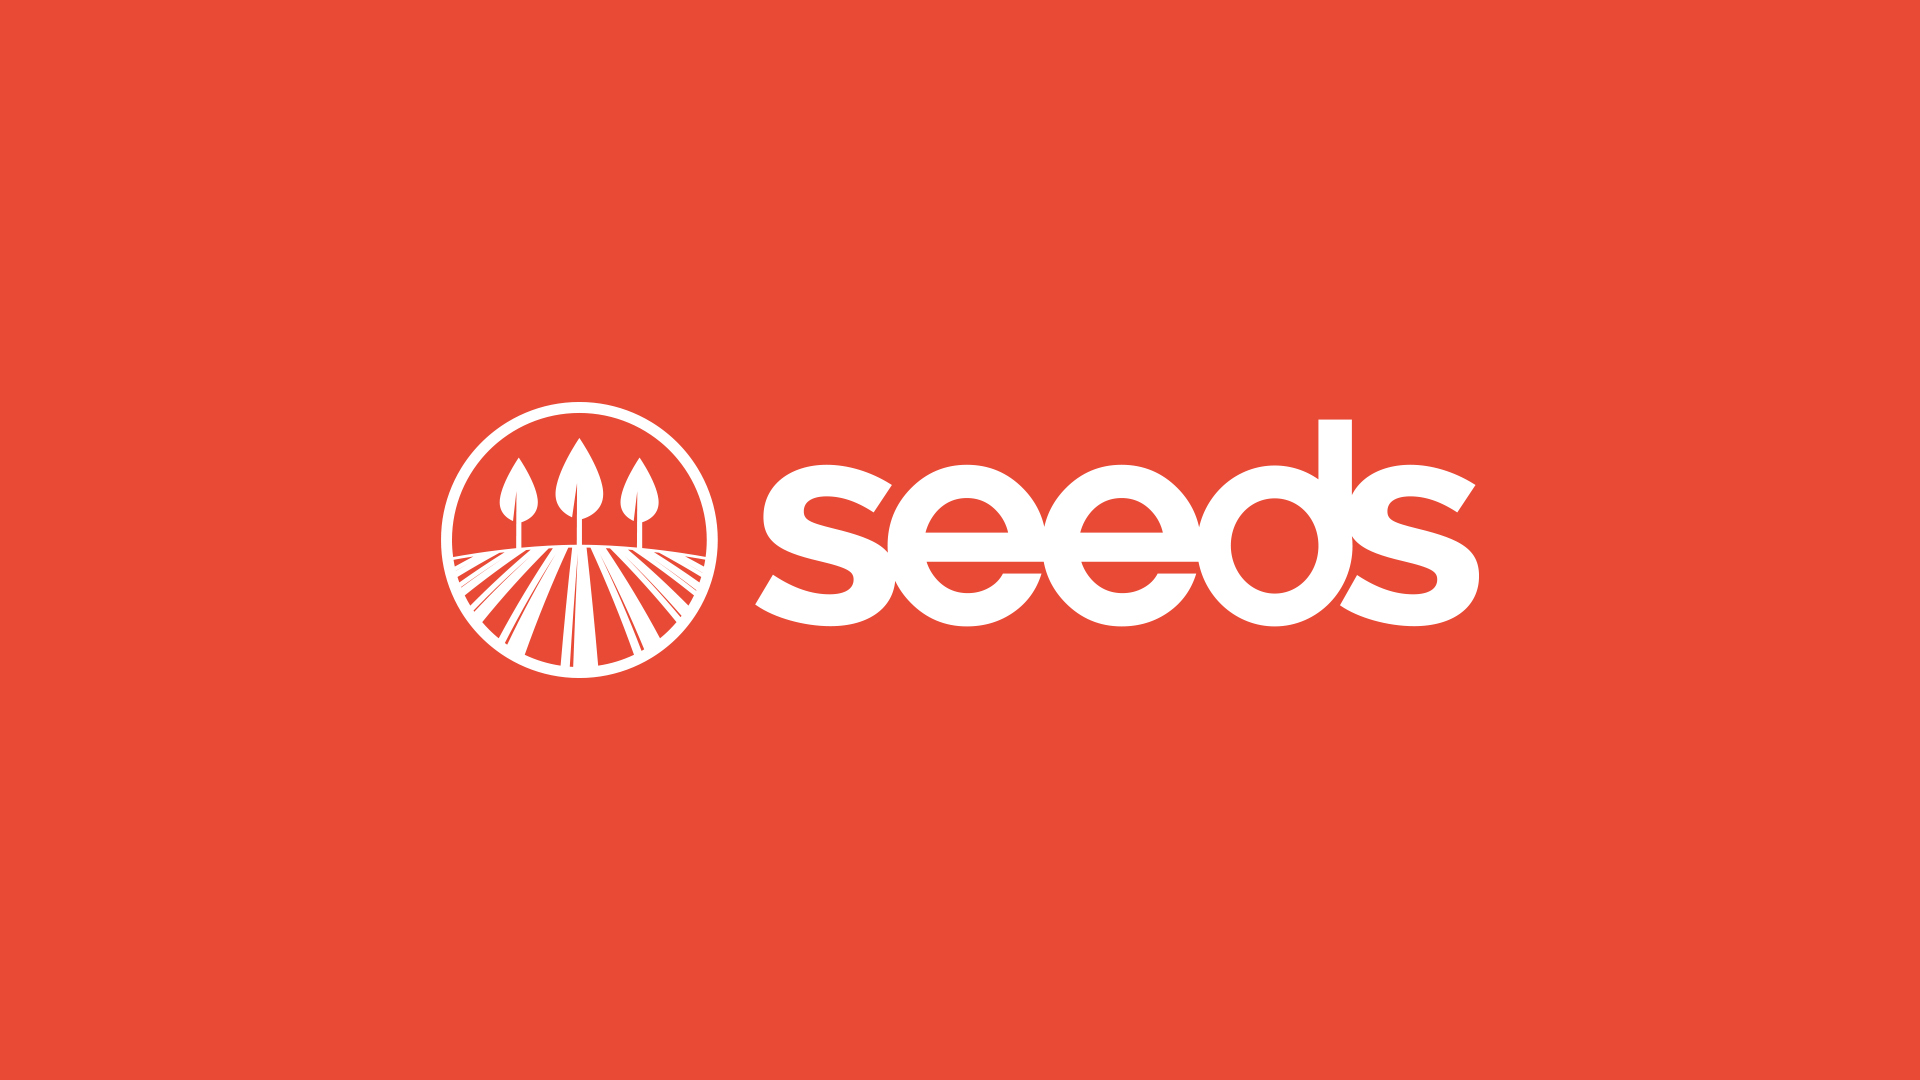 Seeds_Main Slide 02.jpg